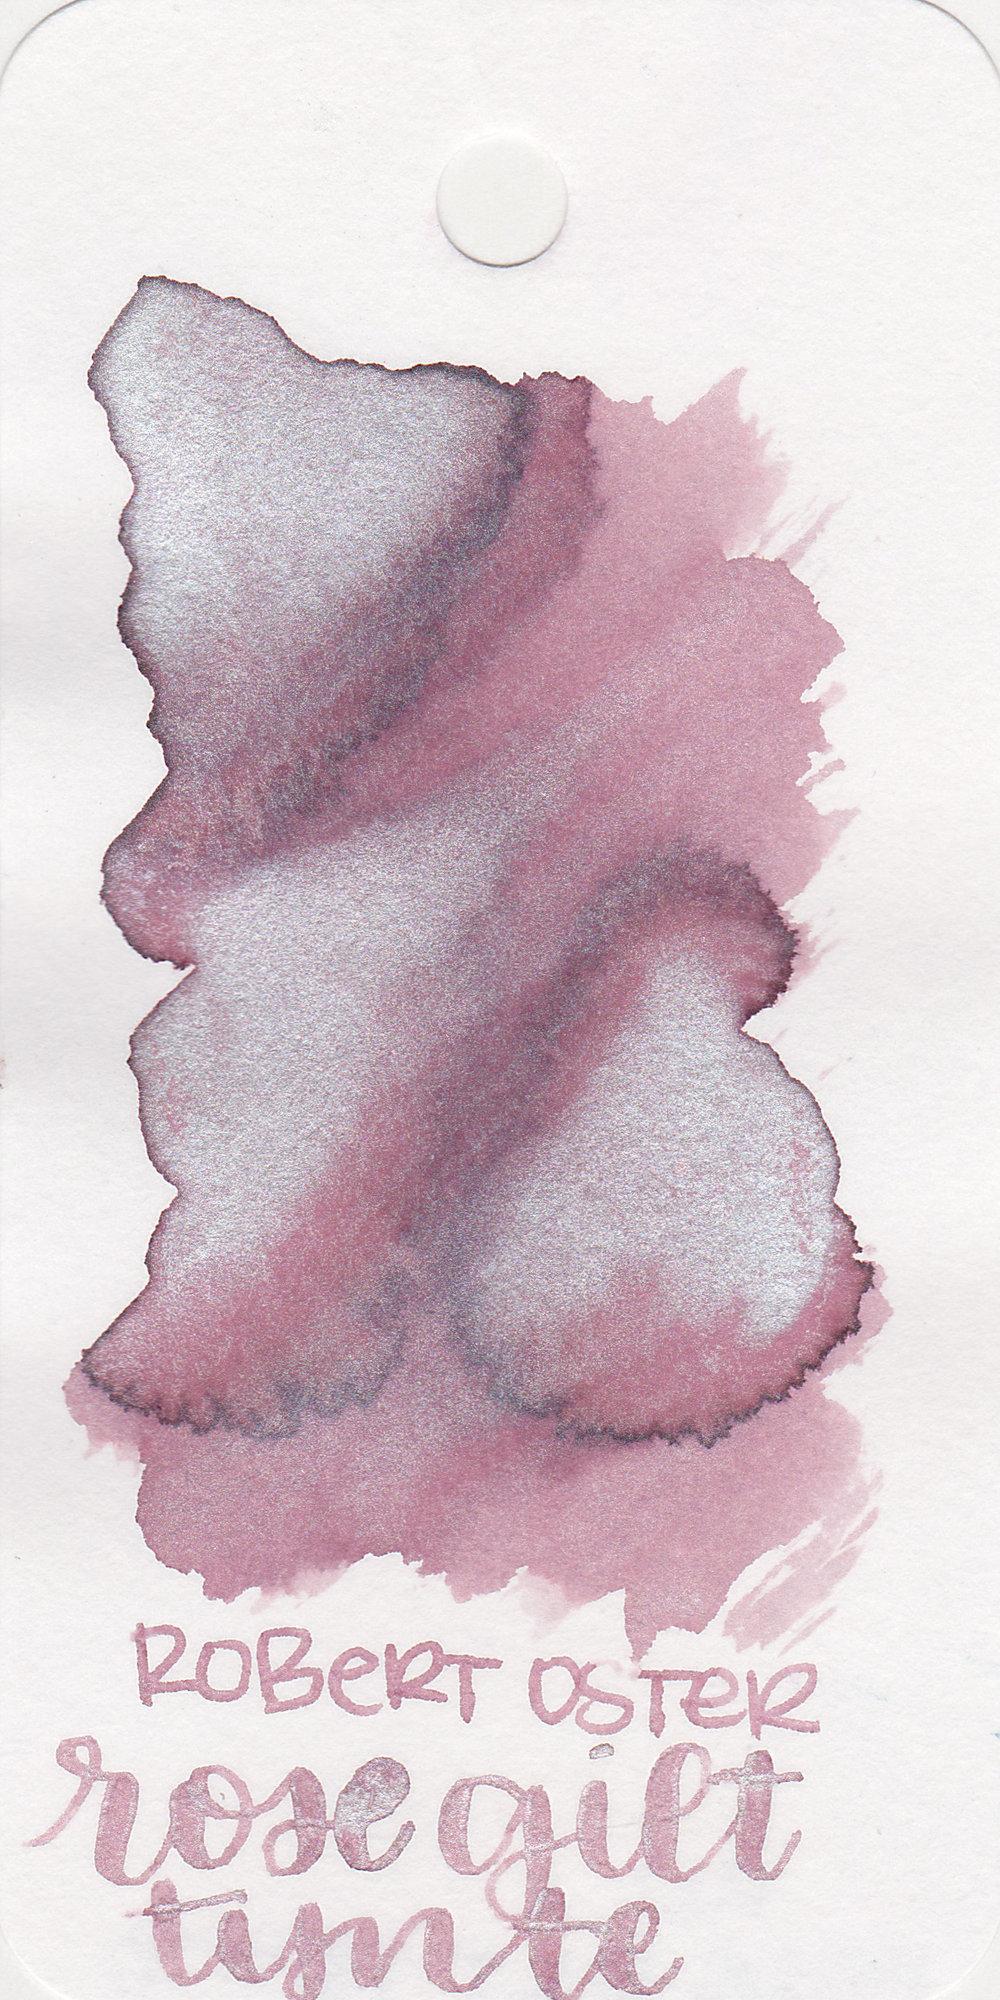 ro-rose-gilt-tynte-1.jpg